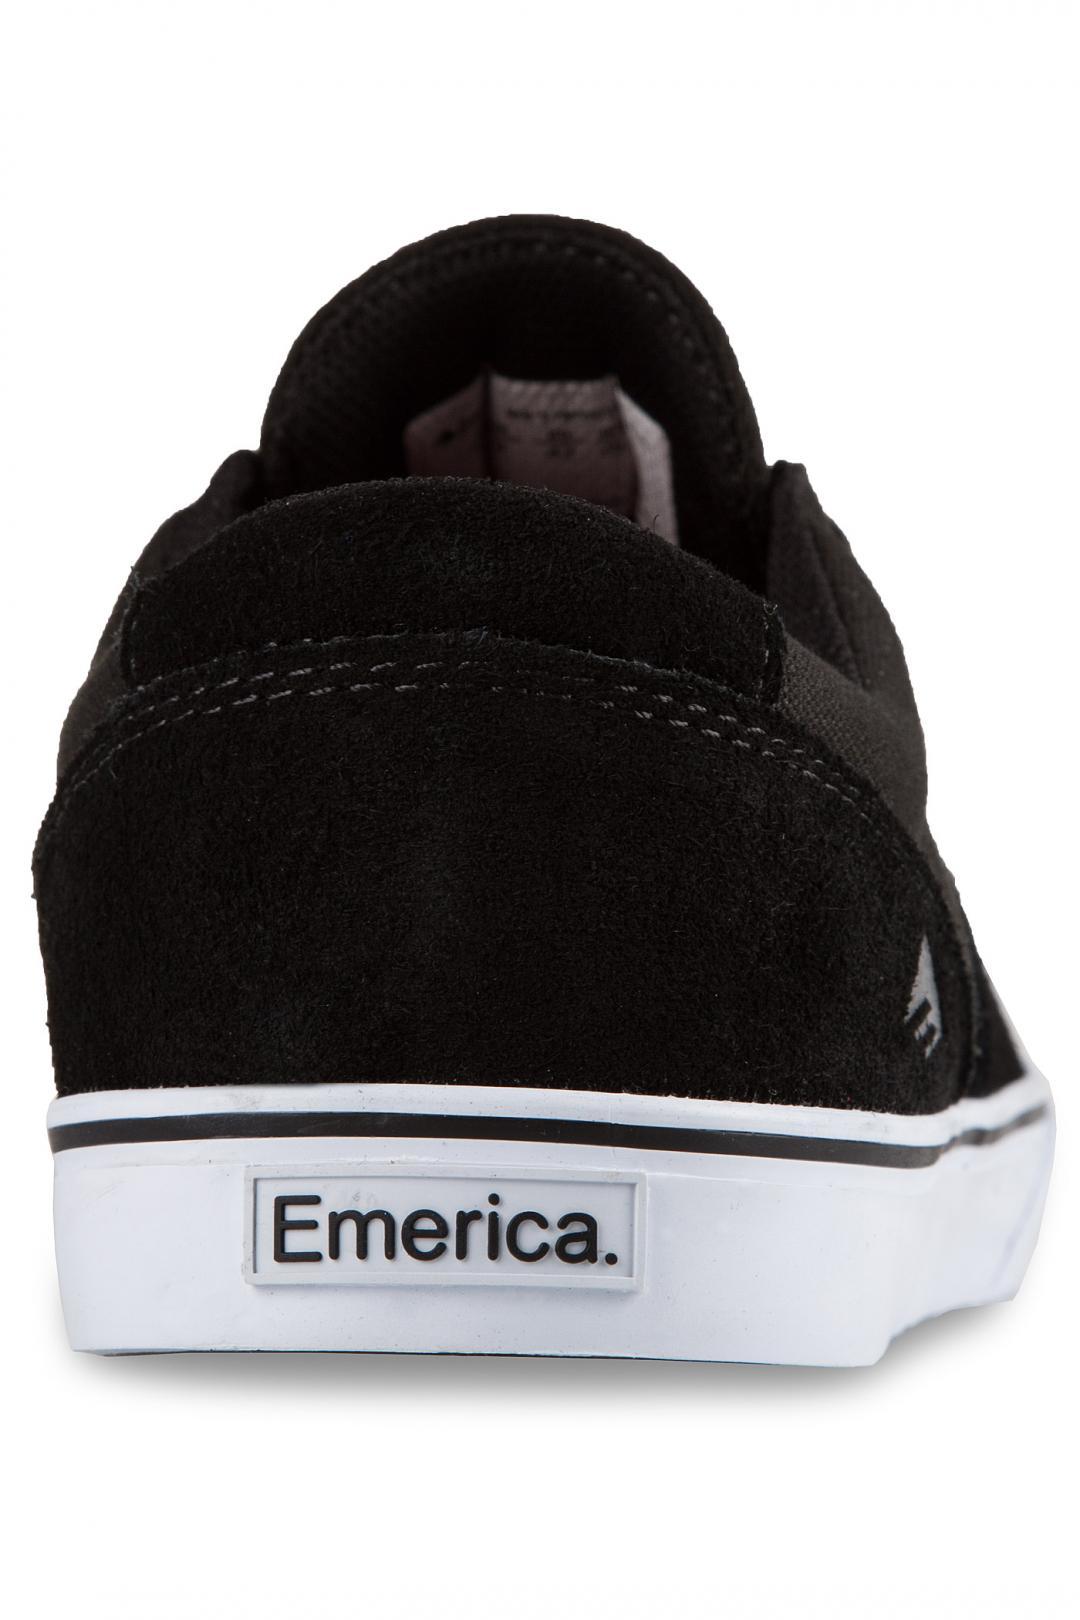 Uomo Emerica Provost Slim Vulc black white | Sneaker